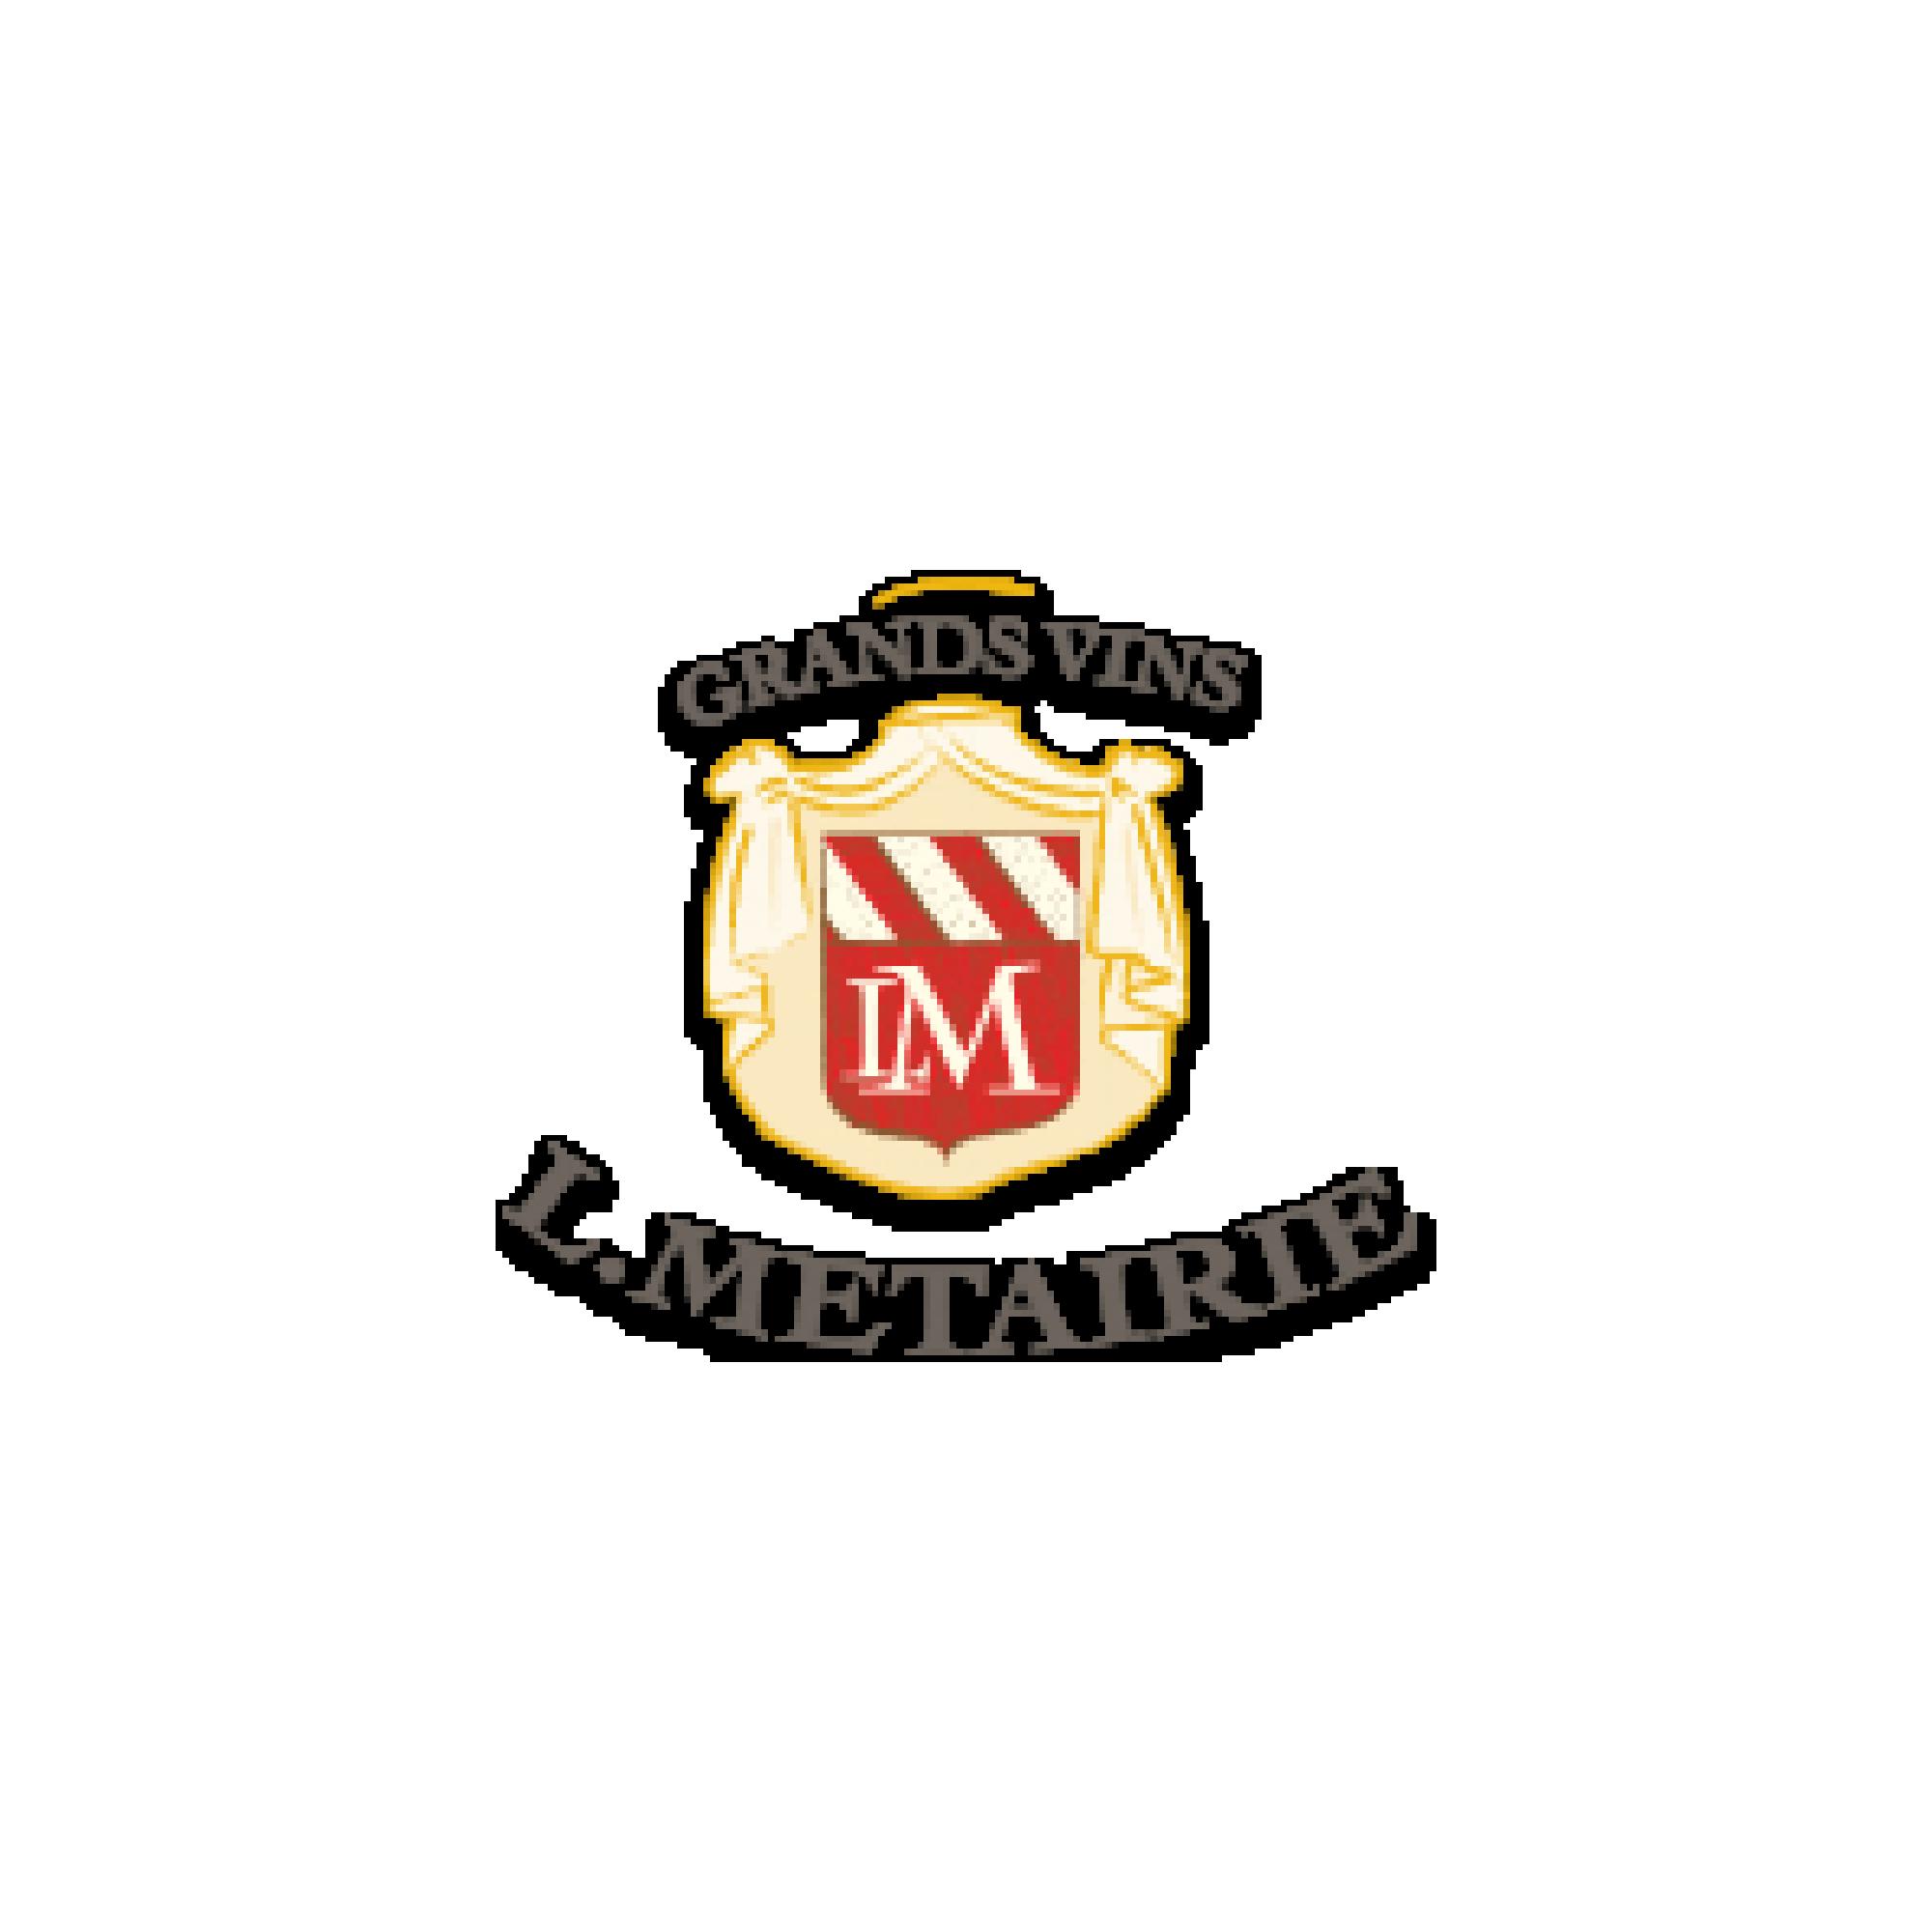 Maison Metairie